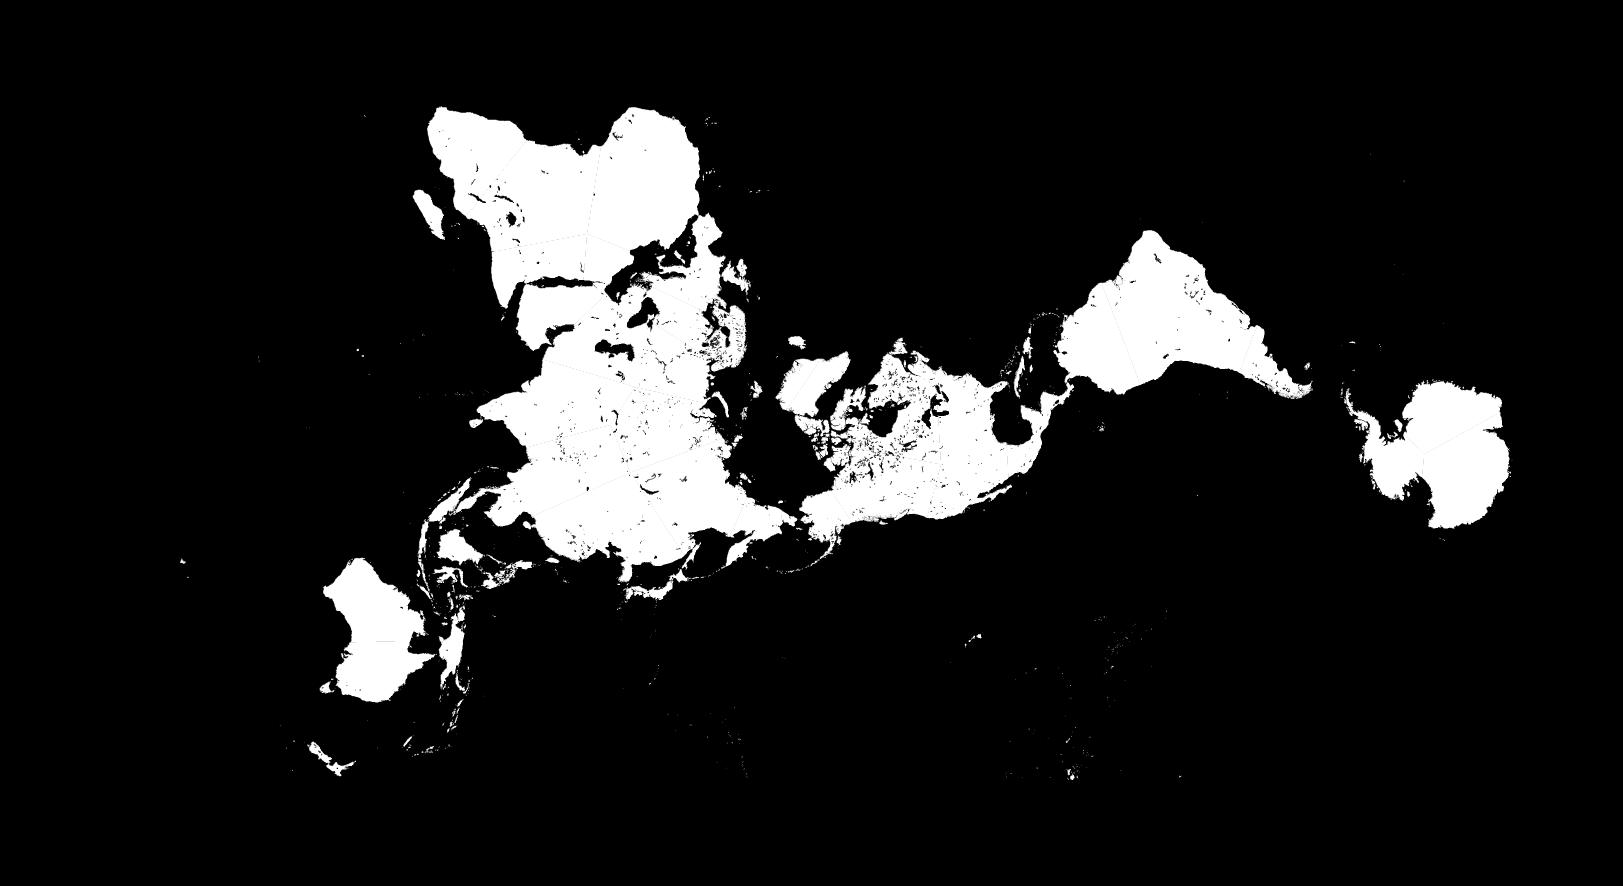 Buckminster fuller dymaxion map laser cutting inspiration buckminster fuller dymaxion map gumiabroncs Choice Image